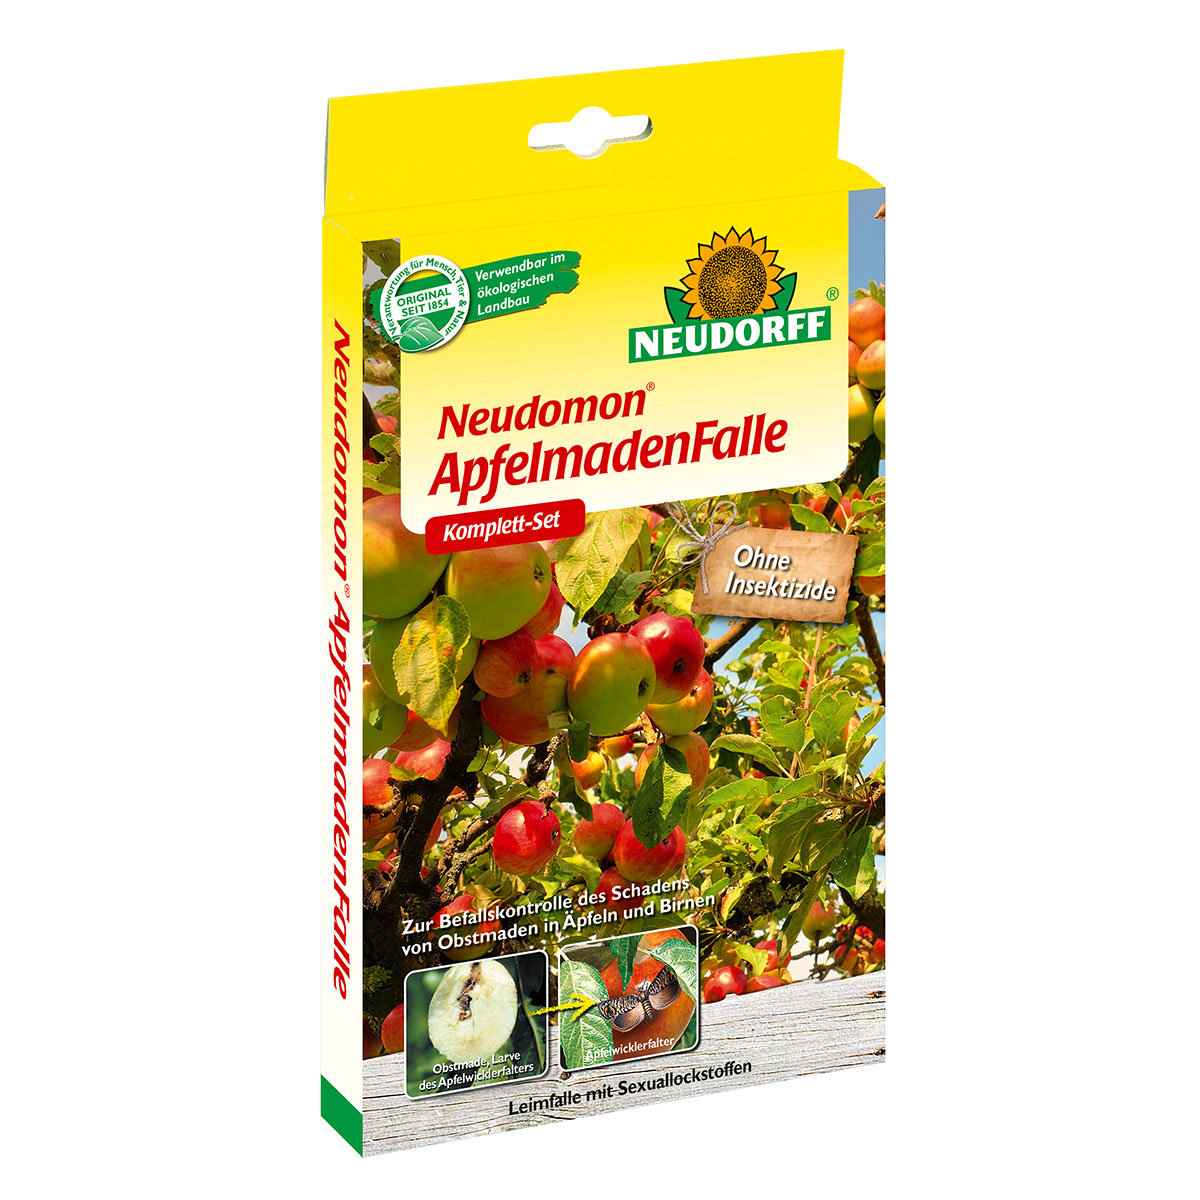 Neudorff Neudomon ApfelmadenFalle, 1 Komplett-Set